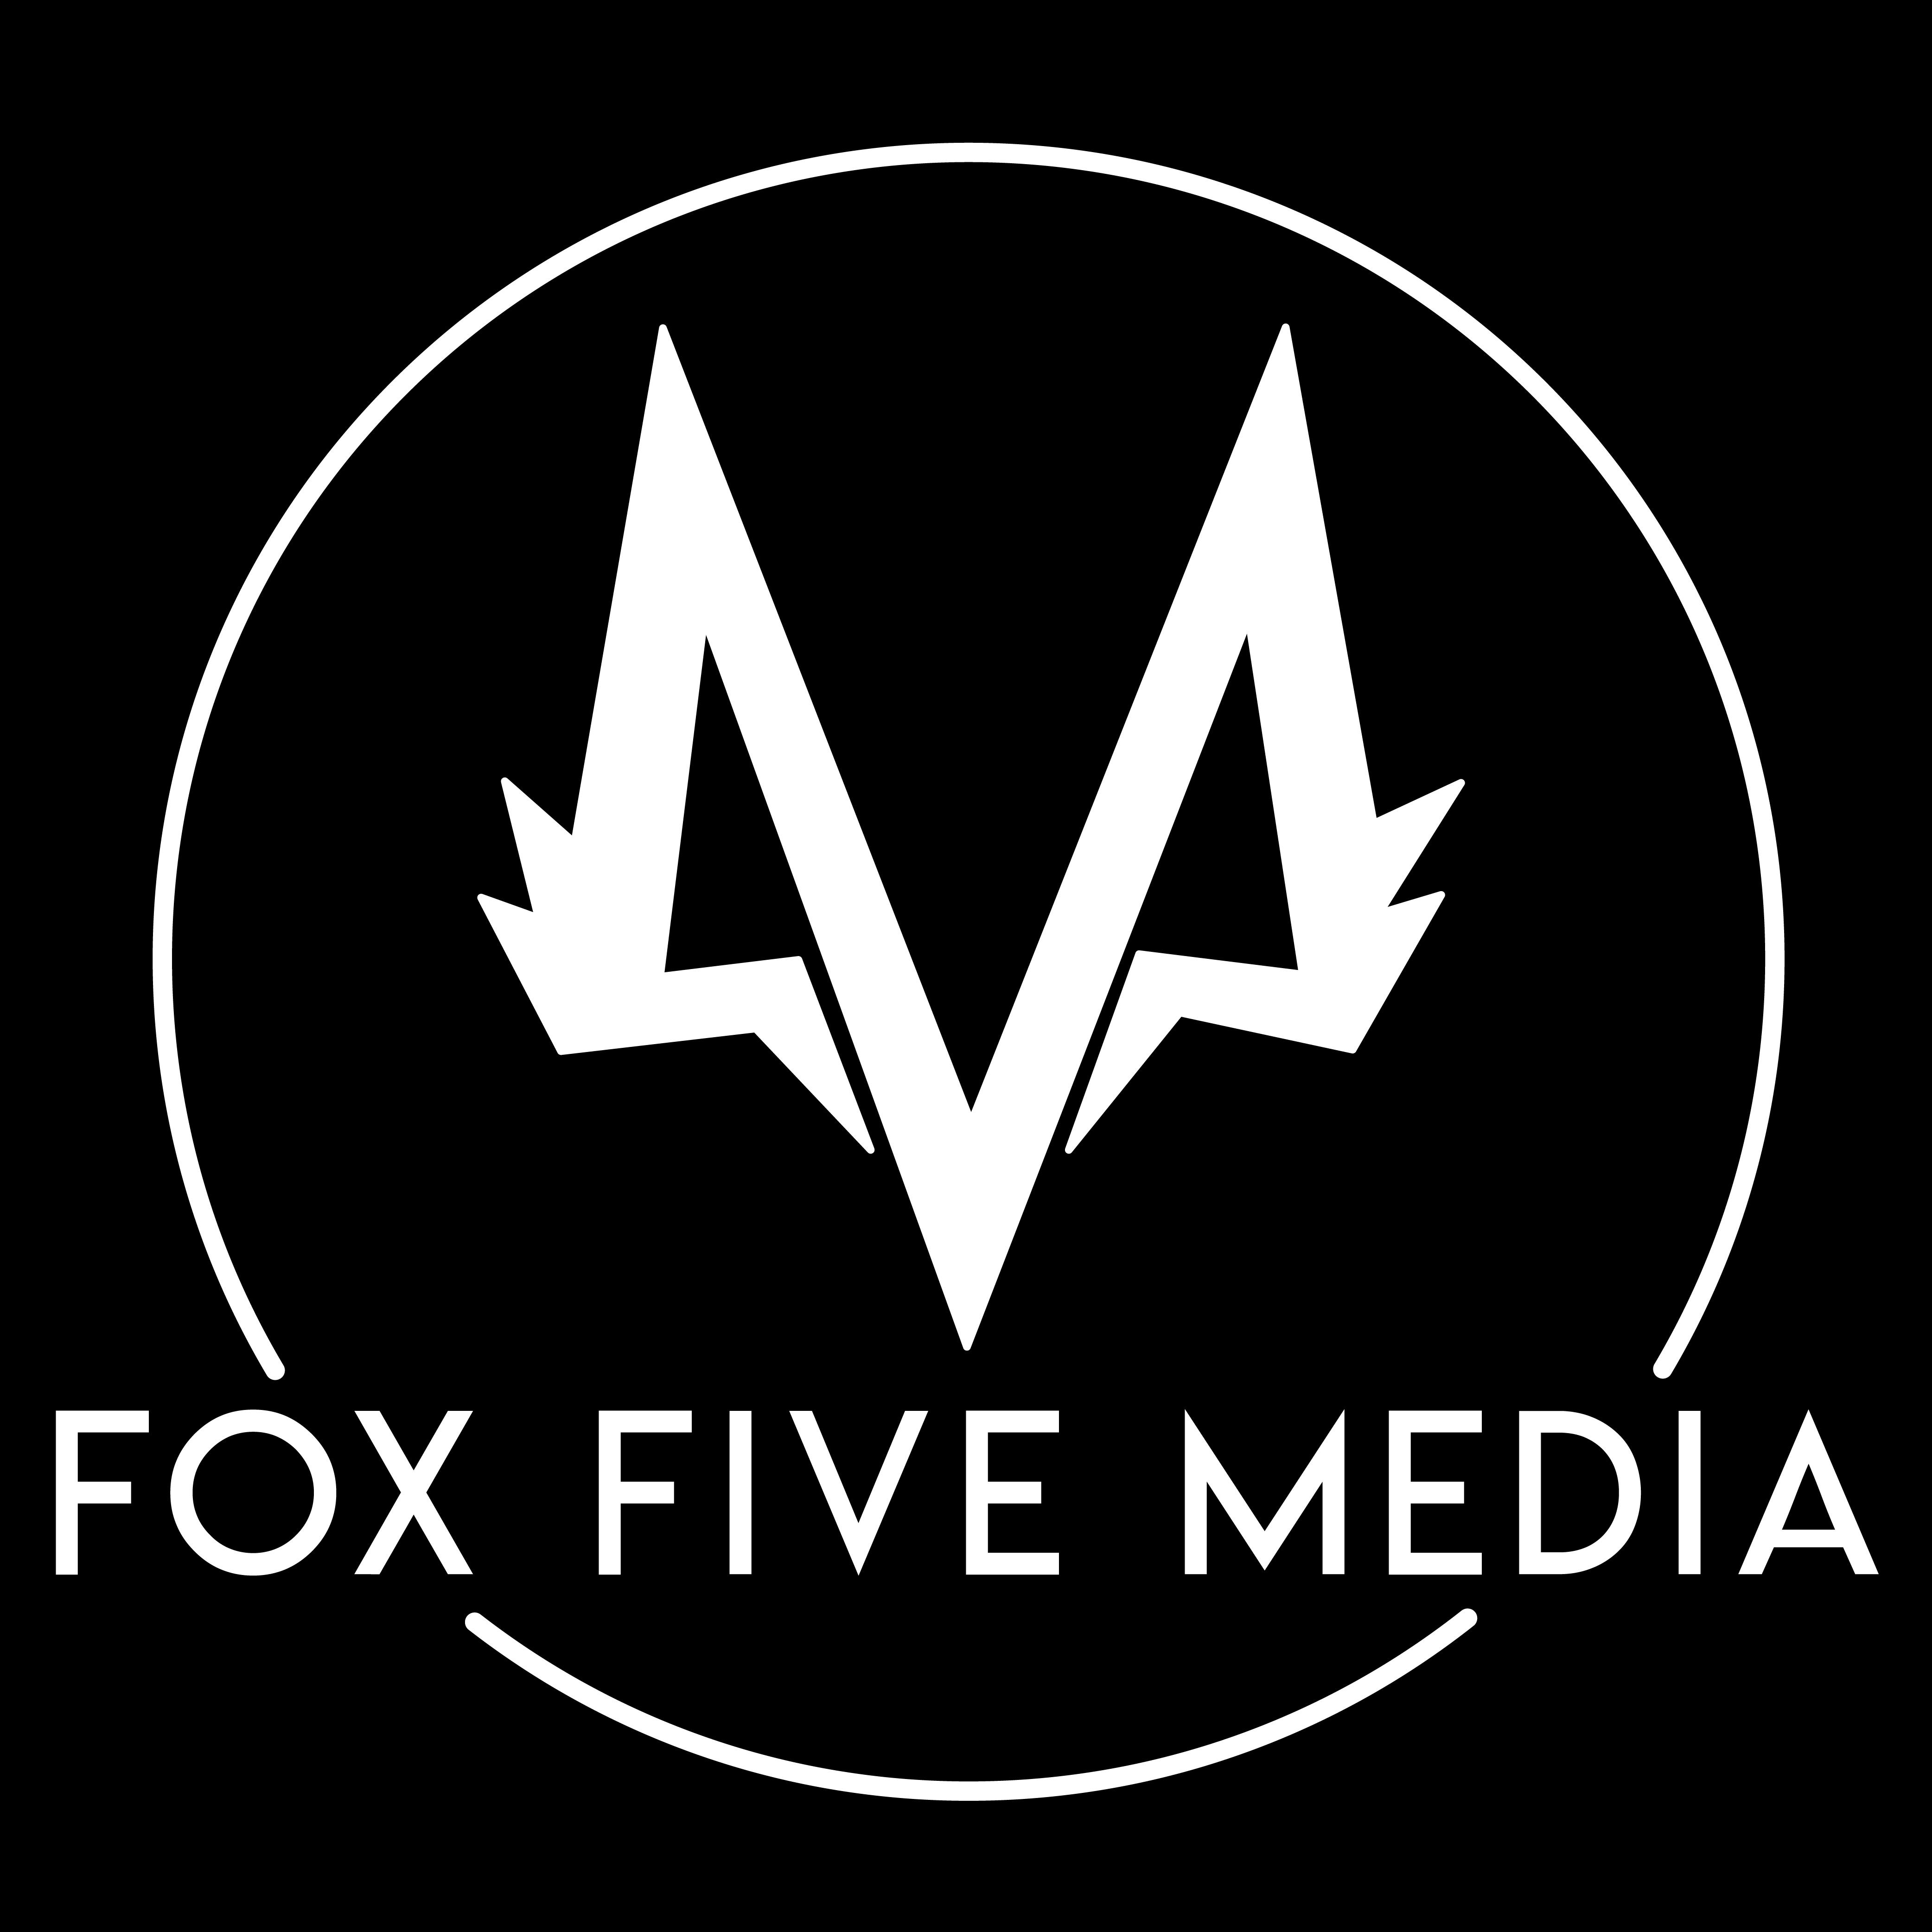 Foxfive